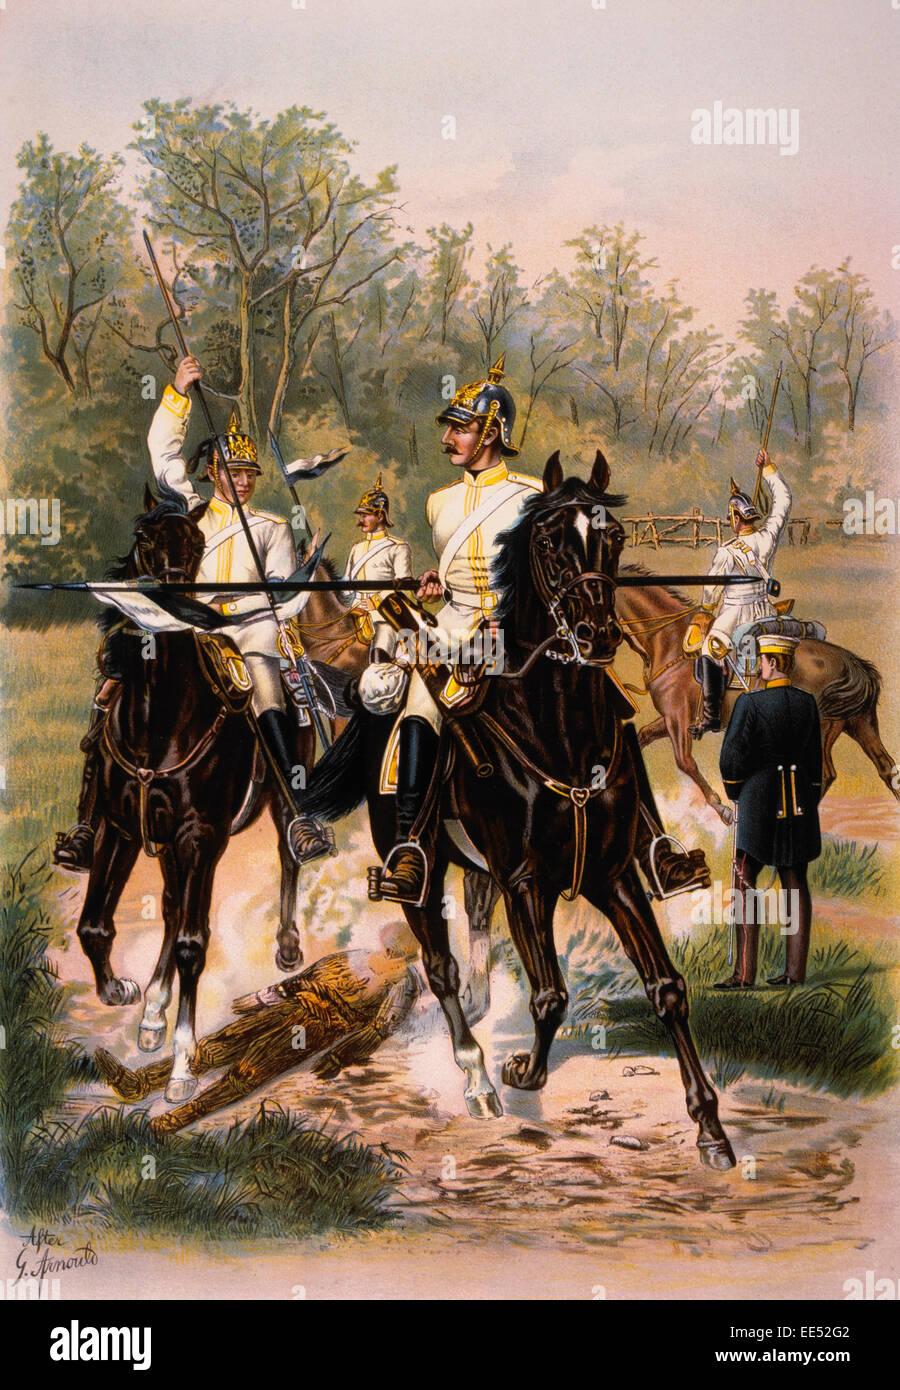 "Lance Exercises, 7th Regiment of Cuirassiers ""Von Seydlitz"", Chromolithograph, 1899 Stock Photo"